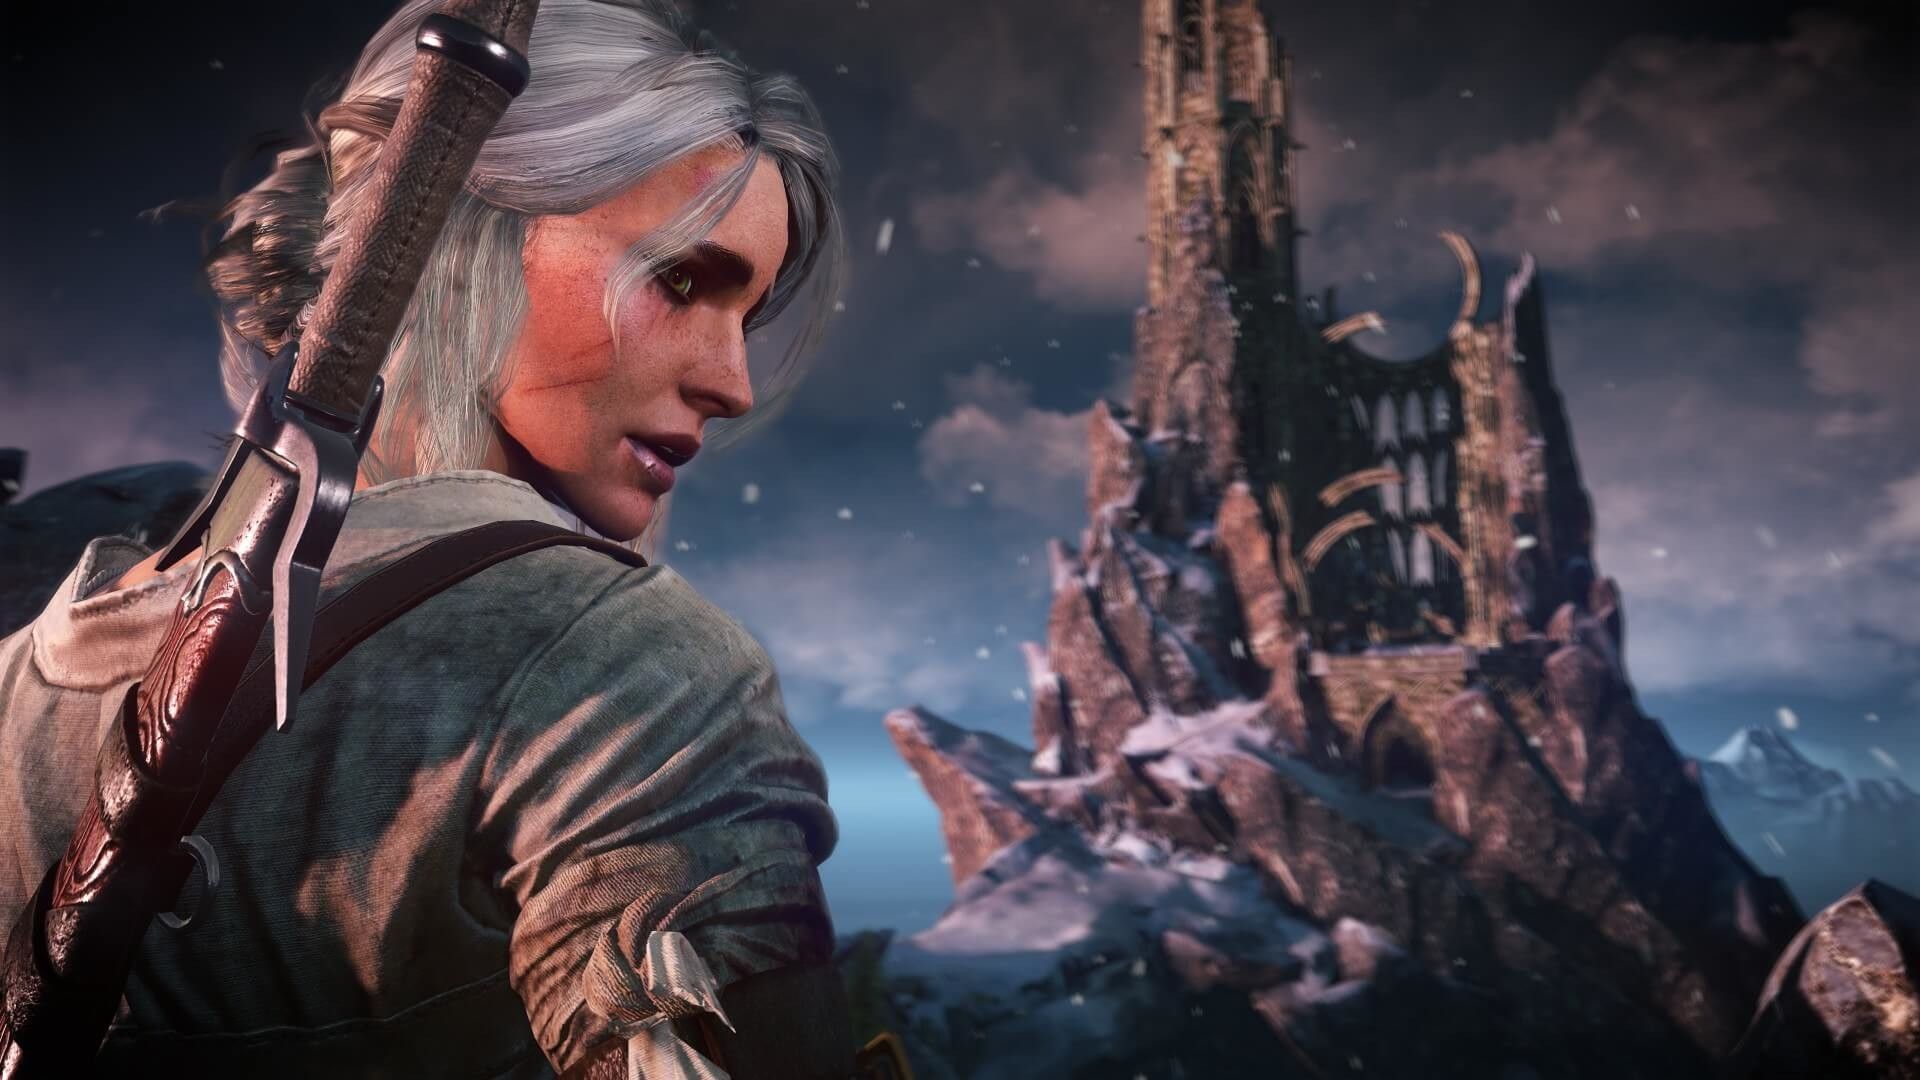 … The Witcher 3: Wild Hunt Ciri Screenshot …